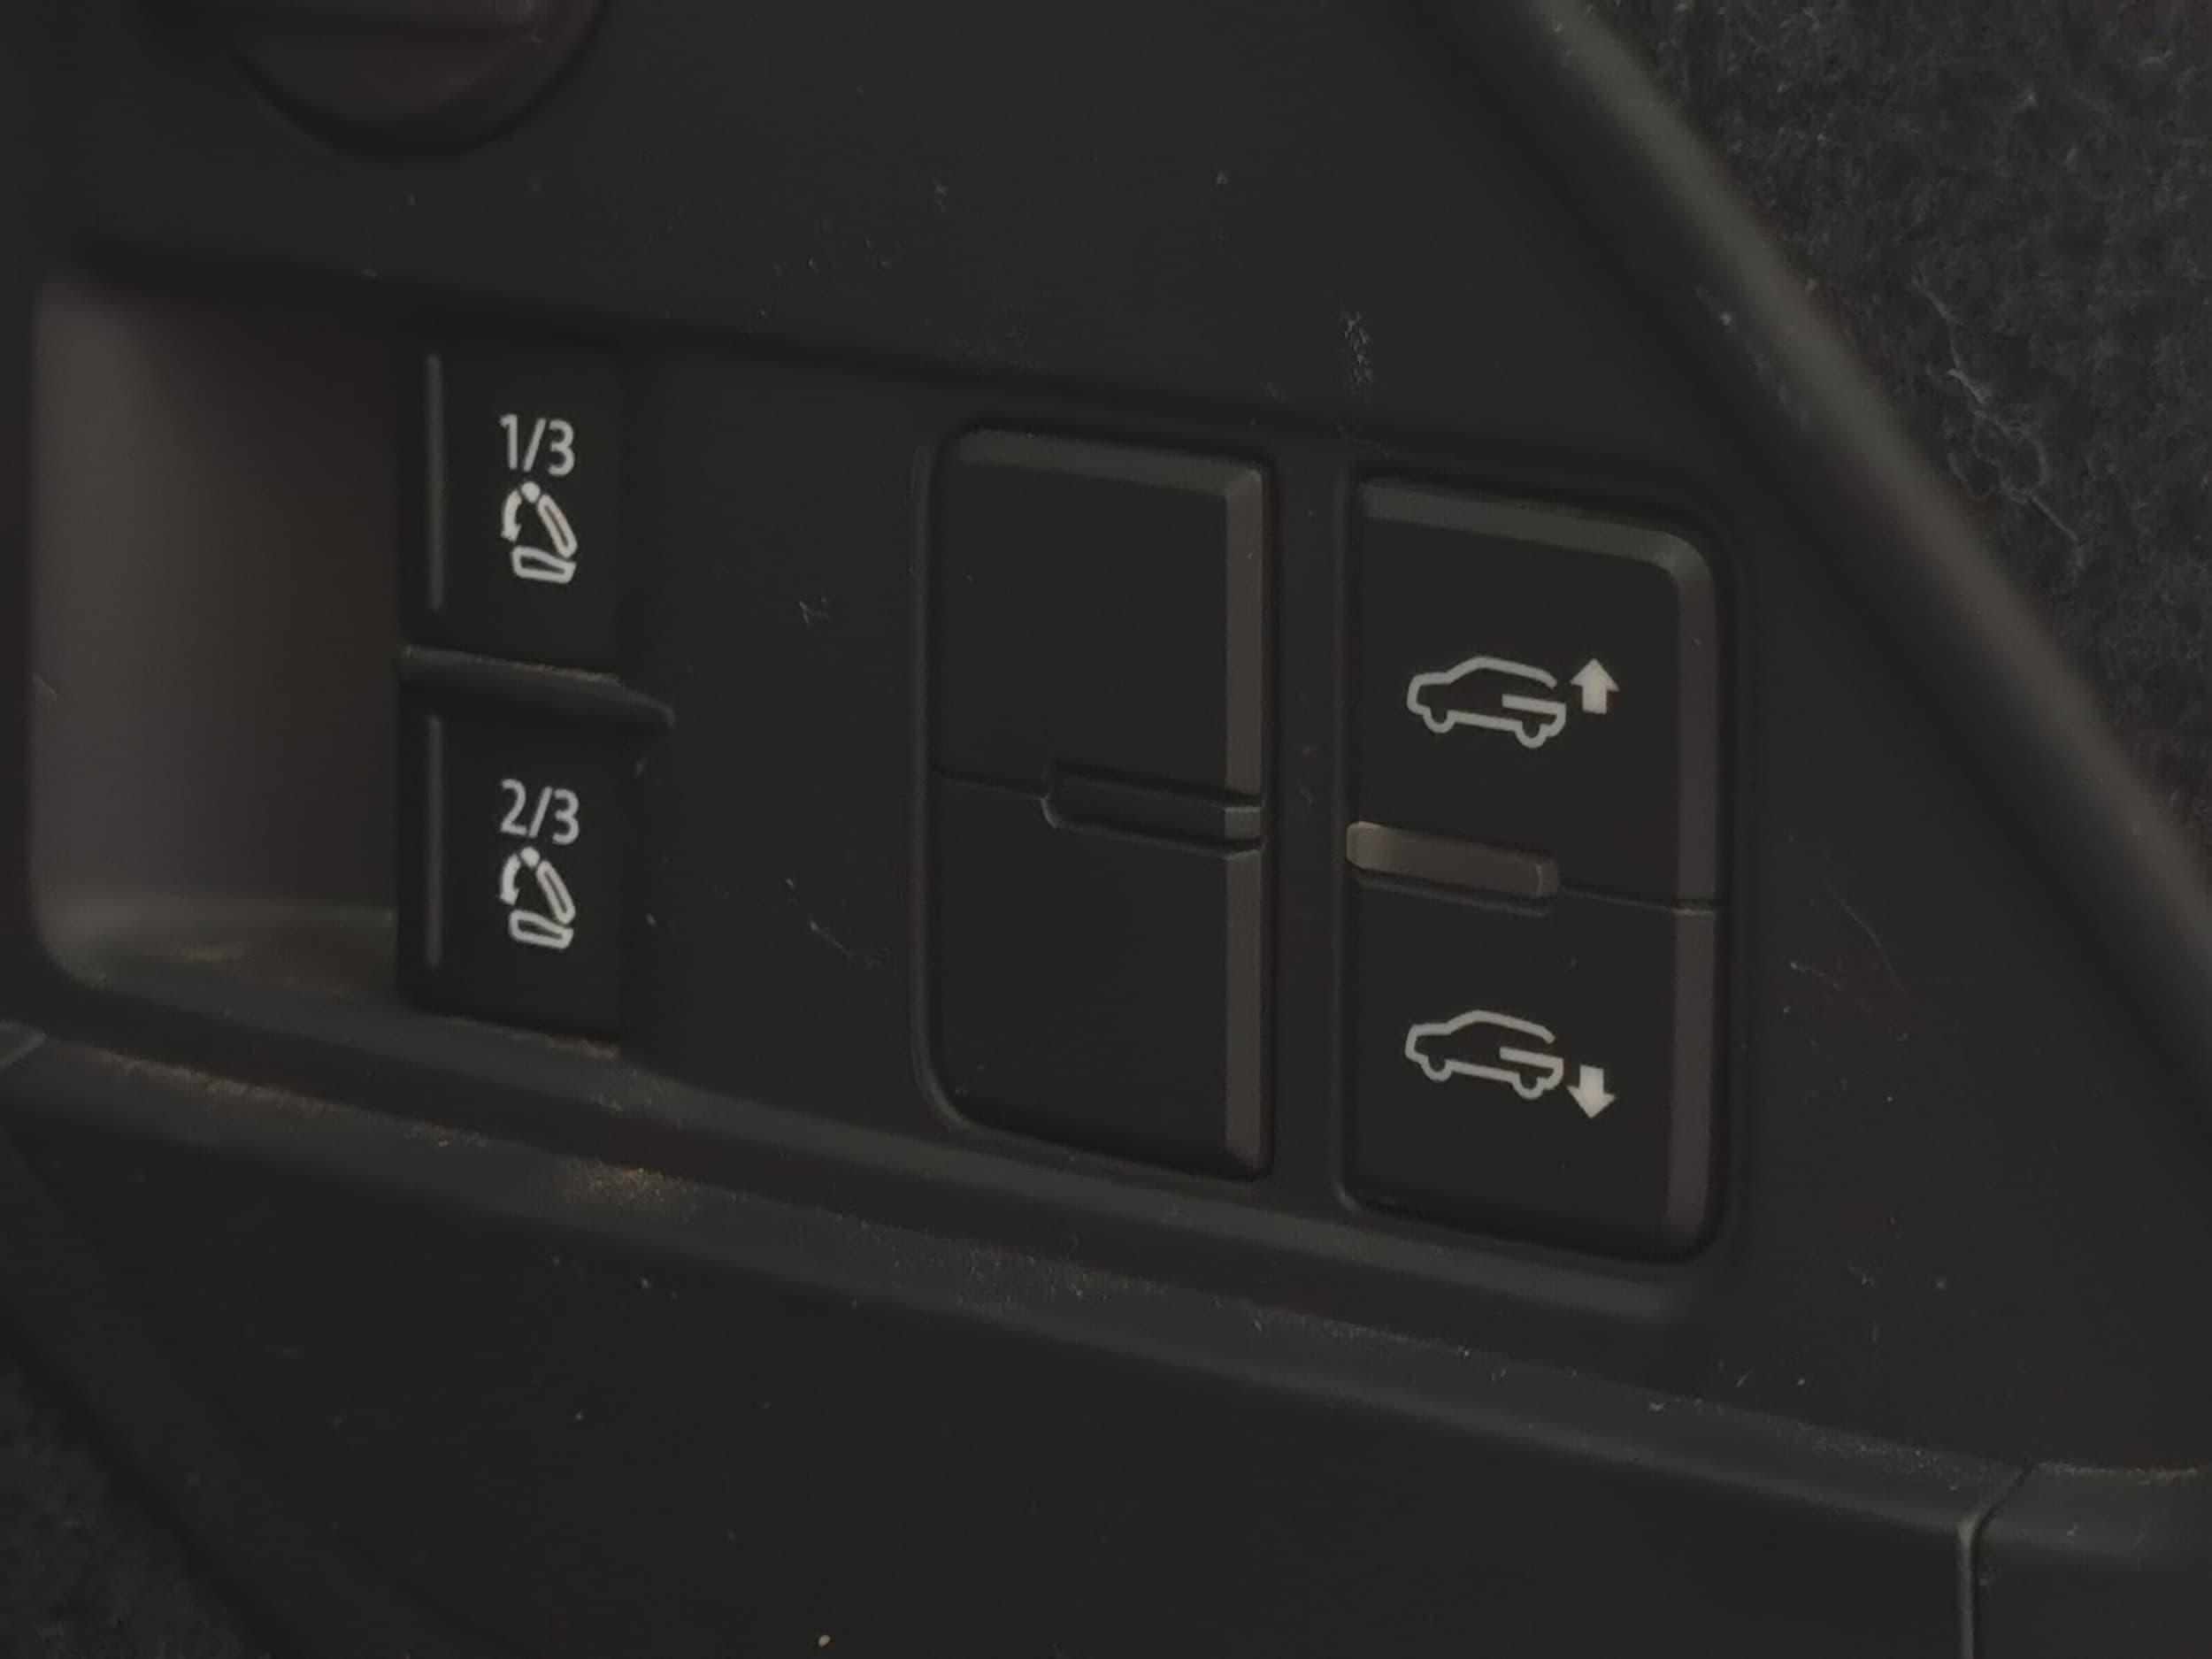 2015 Volkswagen Touareg V6 TDI 7P Auto 4MOTION MY16 - image 21